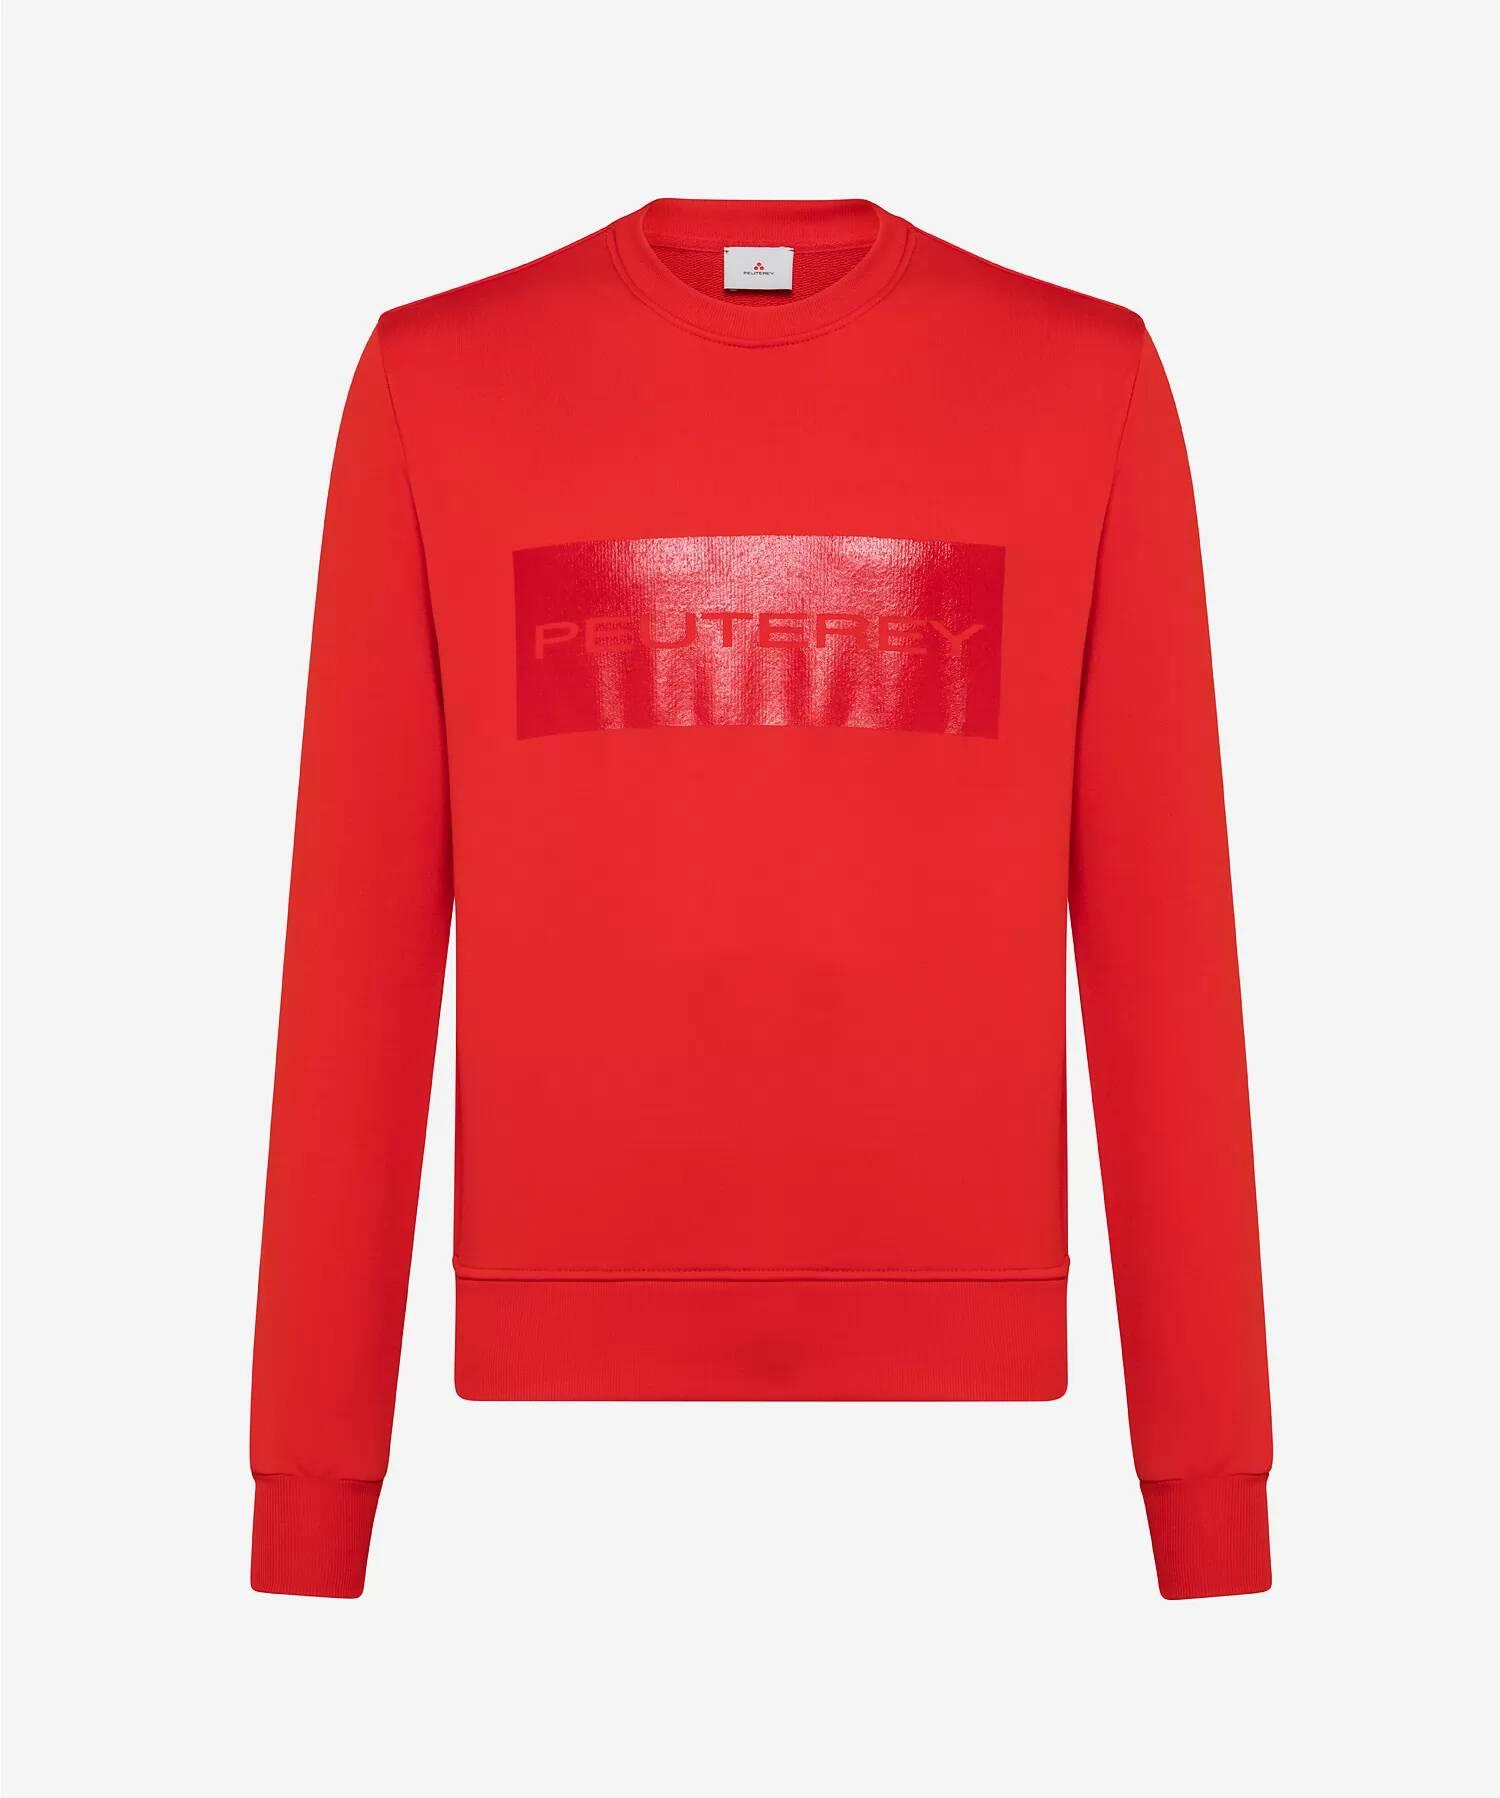 Peuterey_Man_Topwear_Sweatshirtwithletteringincolortone_Red_PEU310899010123004_3_unq16965.jpg